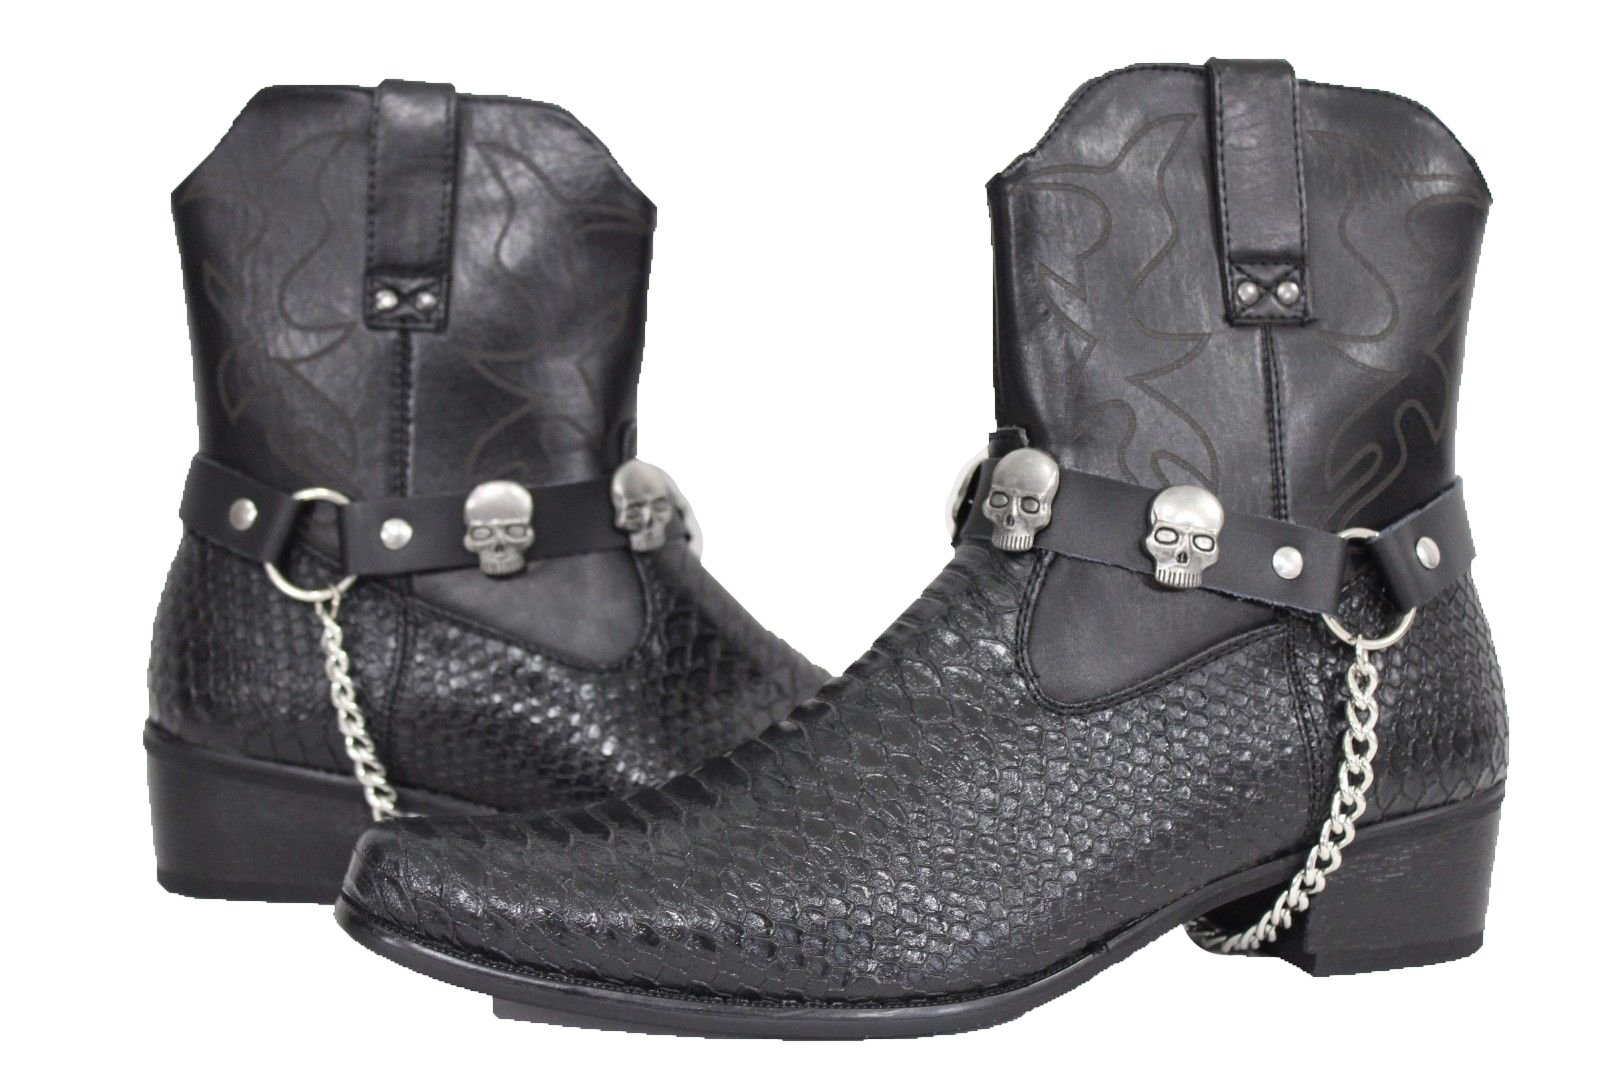 TFJ Men Biker Fashion Black Boot Straps Pair Silver Skulls Shoe Skeleton Charms Motorcycle